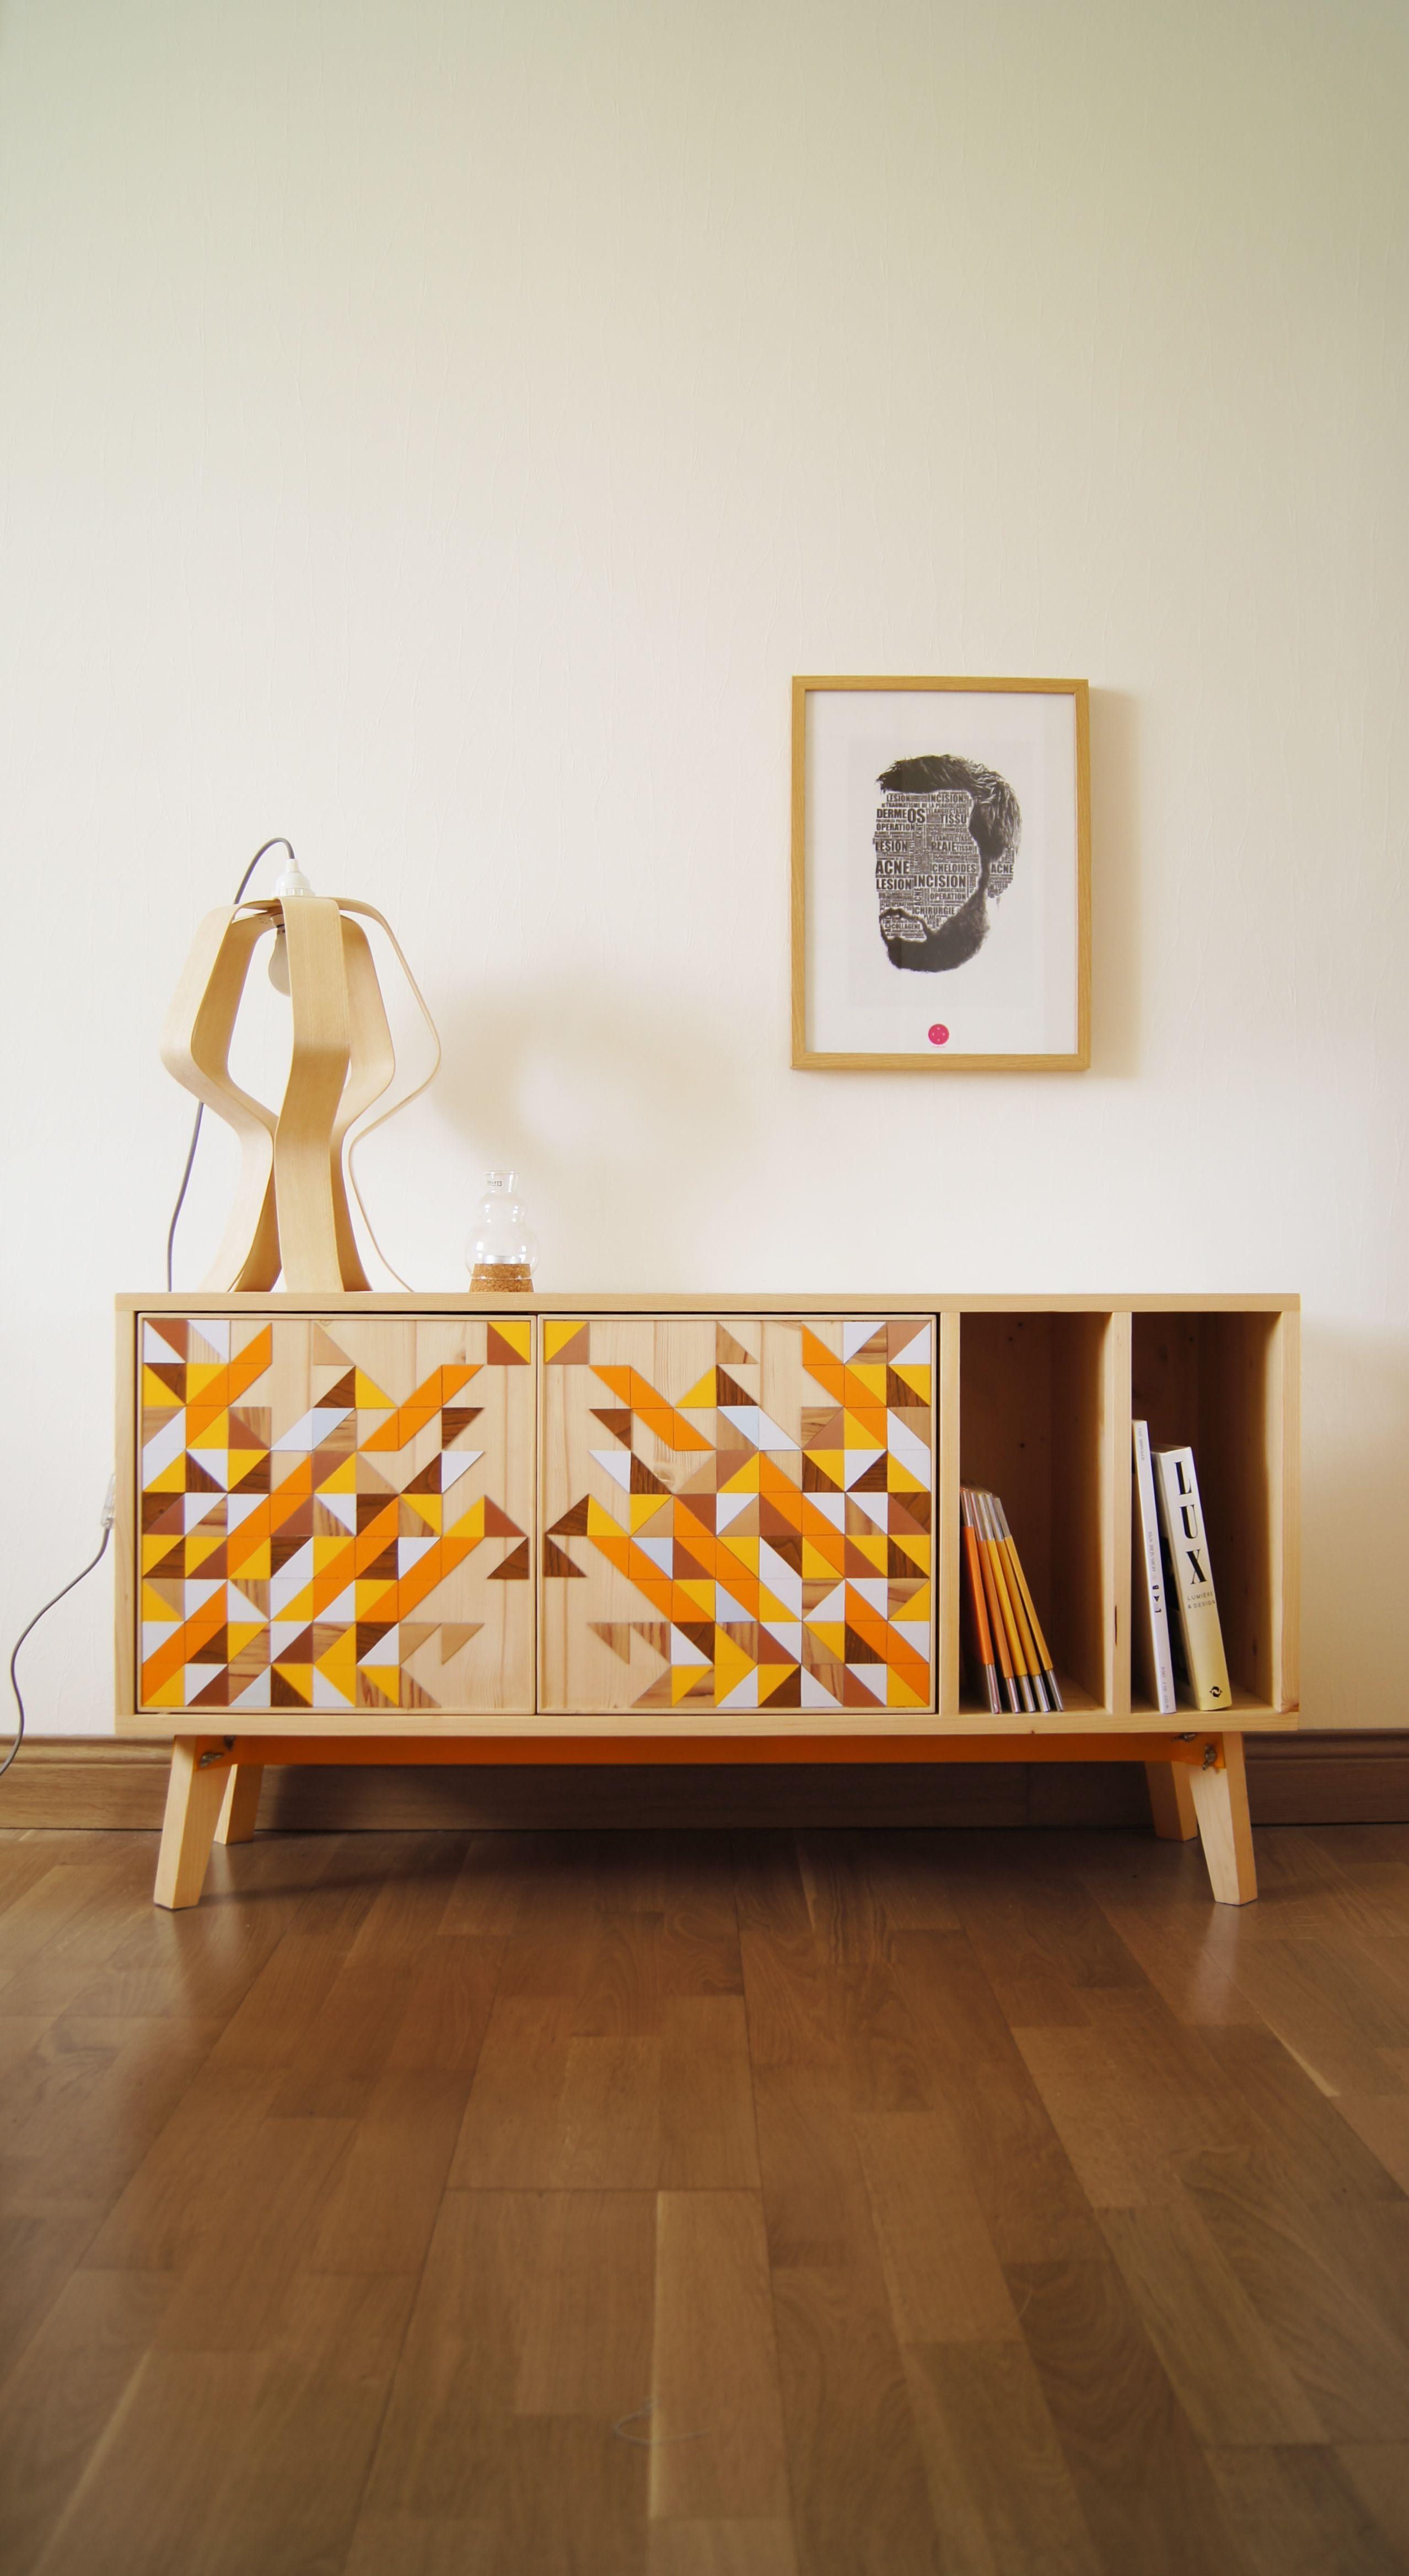 oslo r interpr te la marqueterie diy par mathildefond geometrie pinterest gesellenst ck. Black Bedroom Furniture Sets. Home Design Ideas